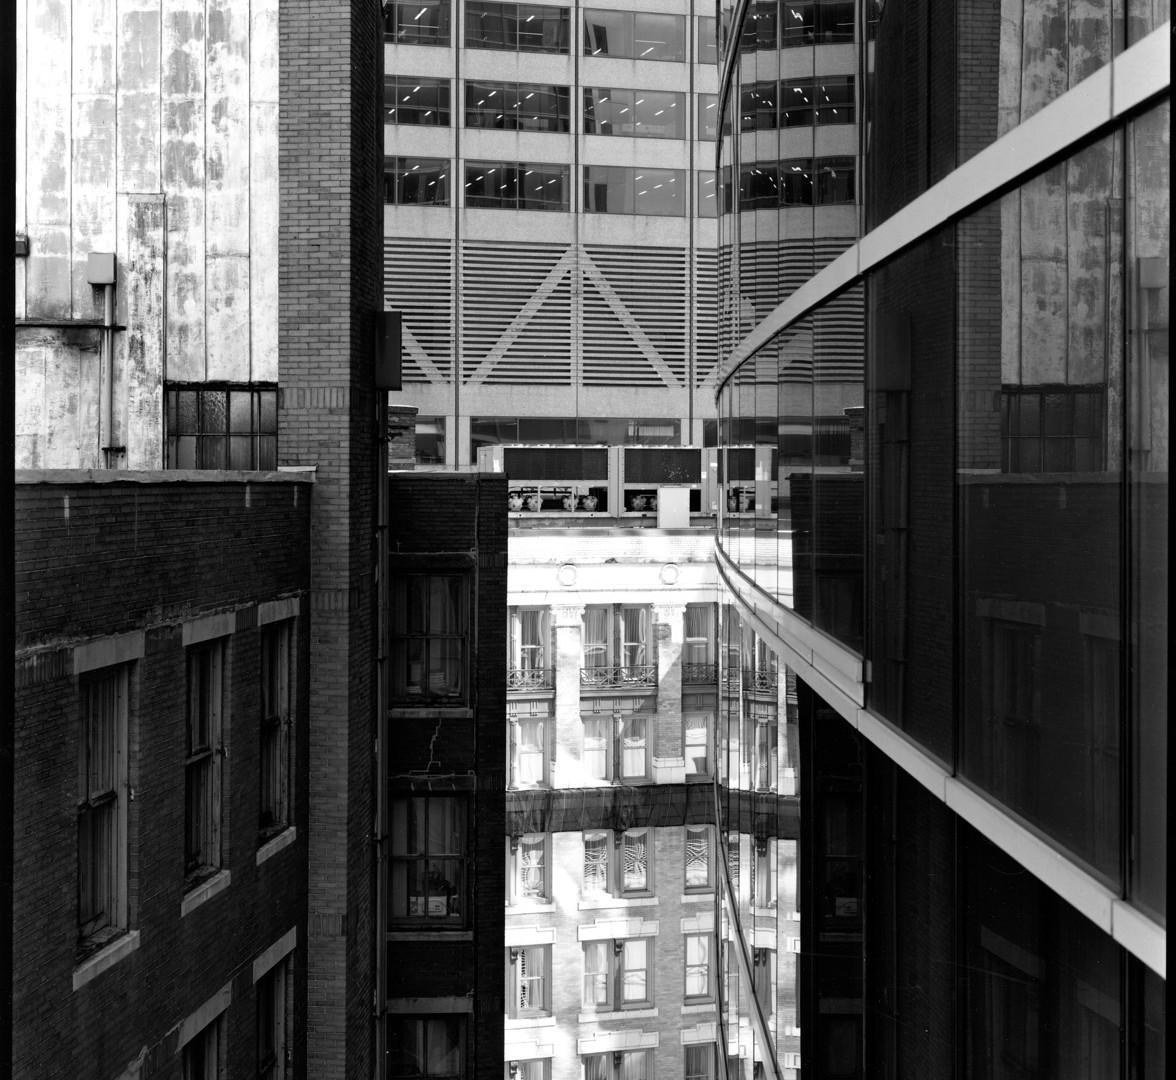 Nicholas Nixon, View of Arch Street, Boston, 2008